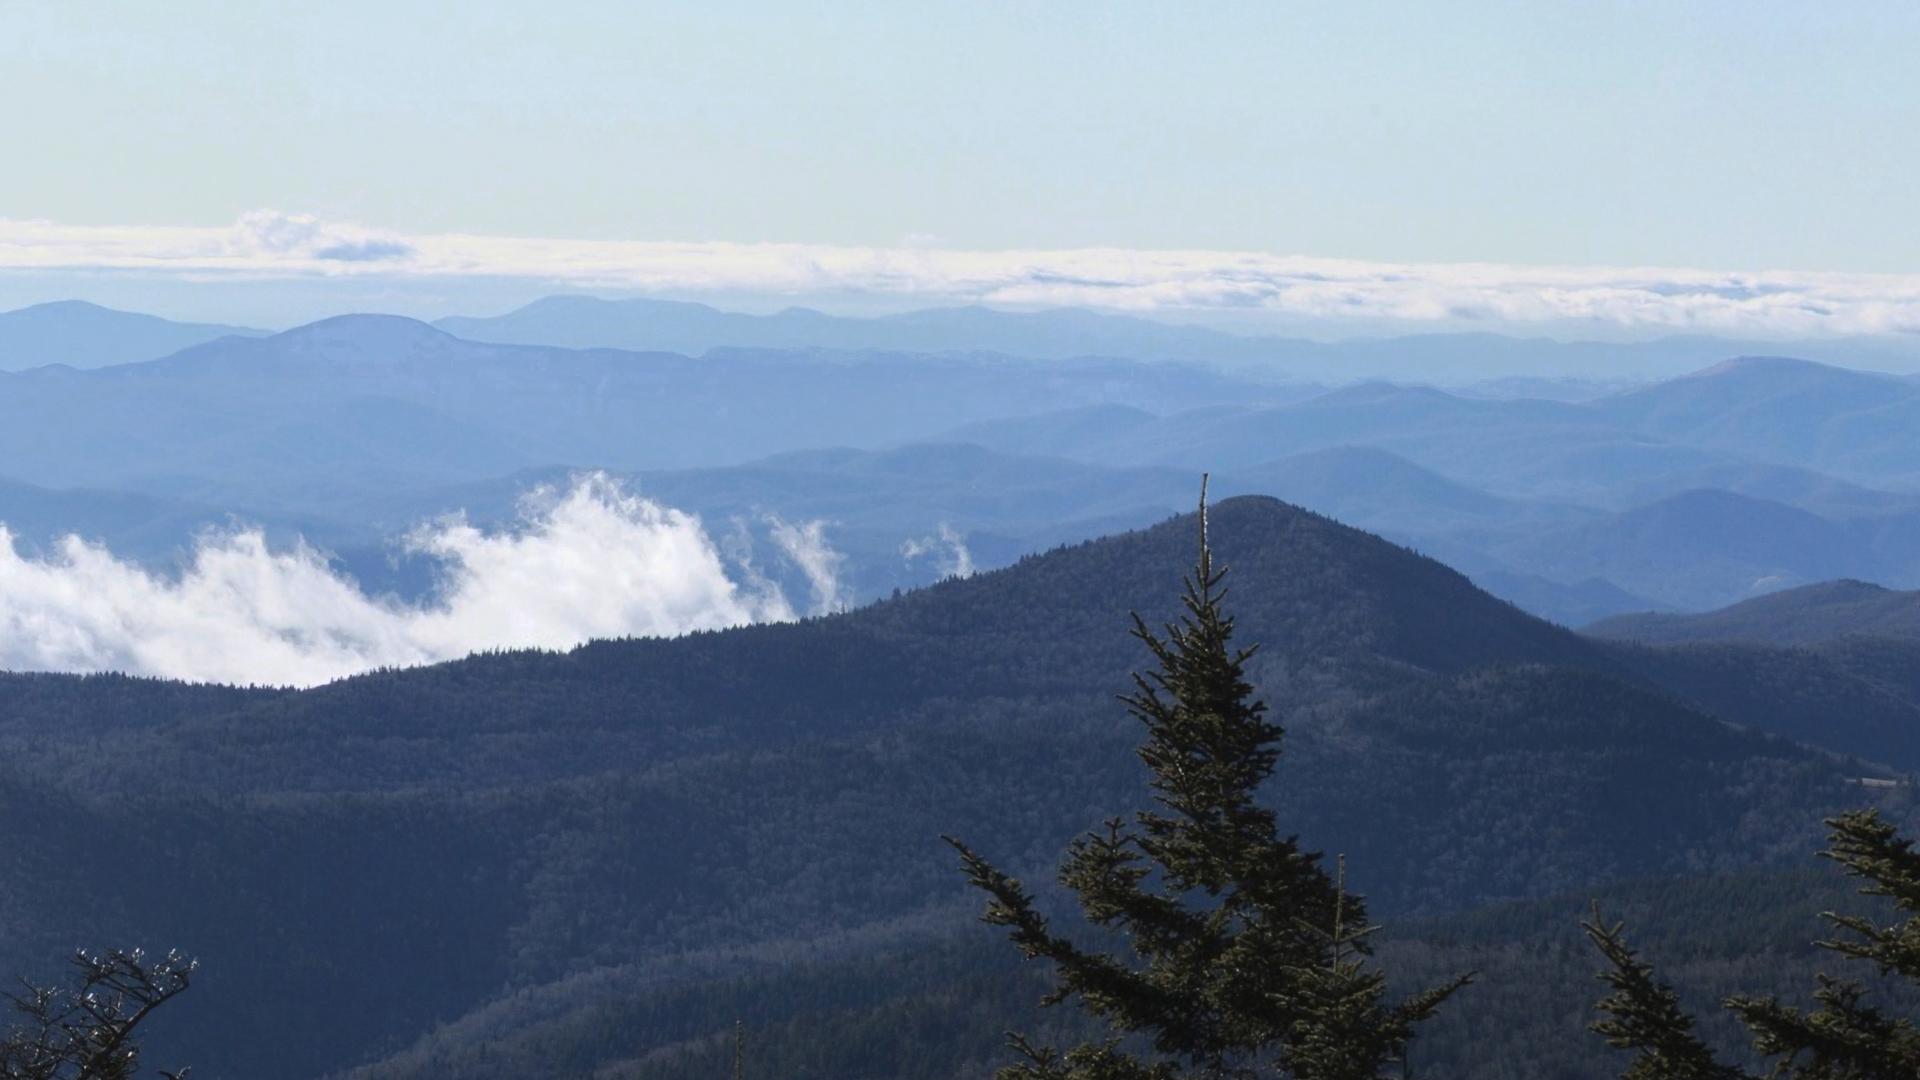 Mt. Mitchel Inset